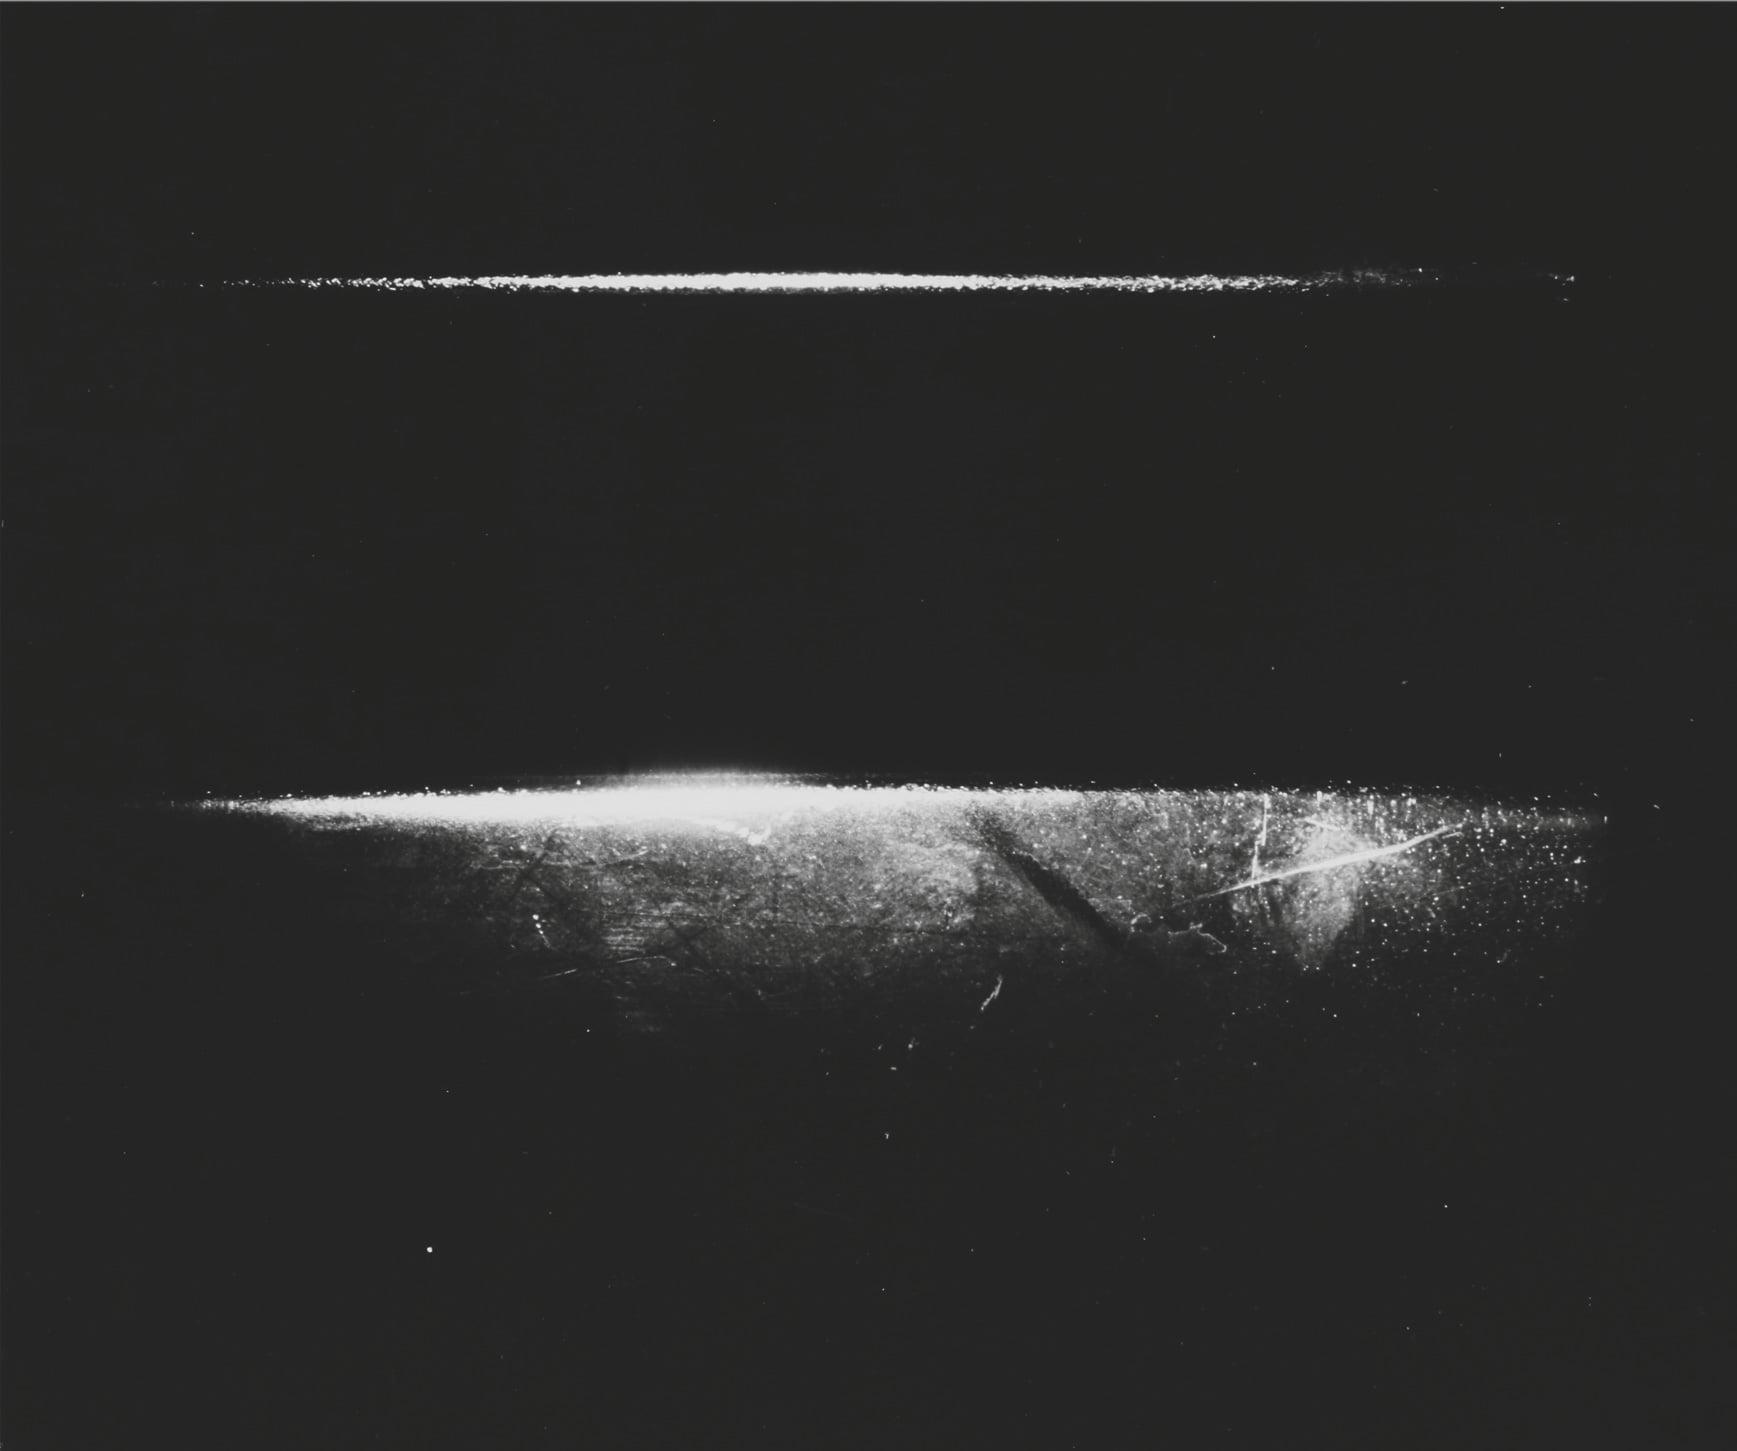 Johanna Daab | Horizont, 2007 | 100 x 85 cm, Silbergelatineabzug